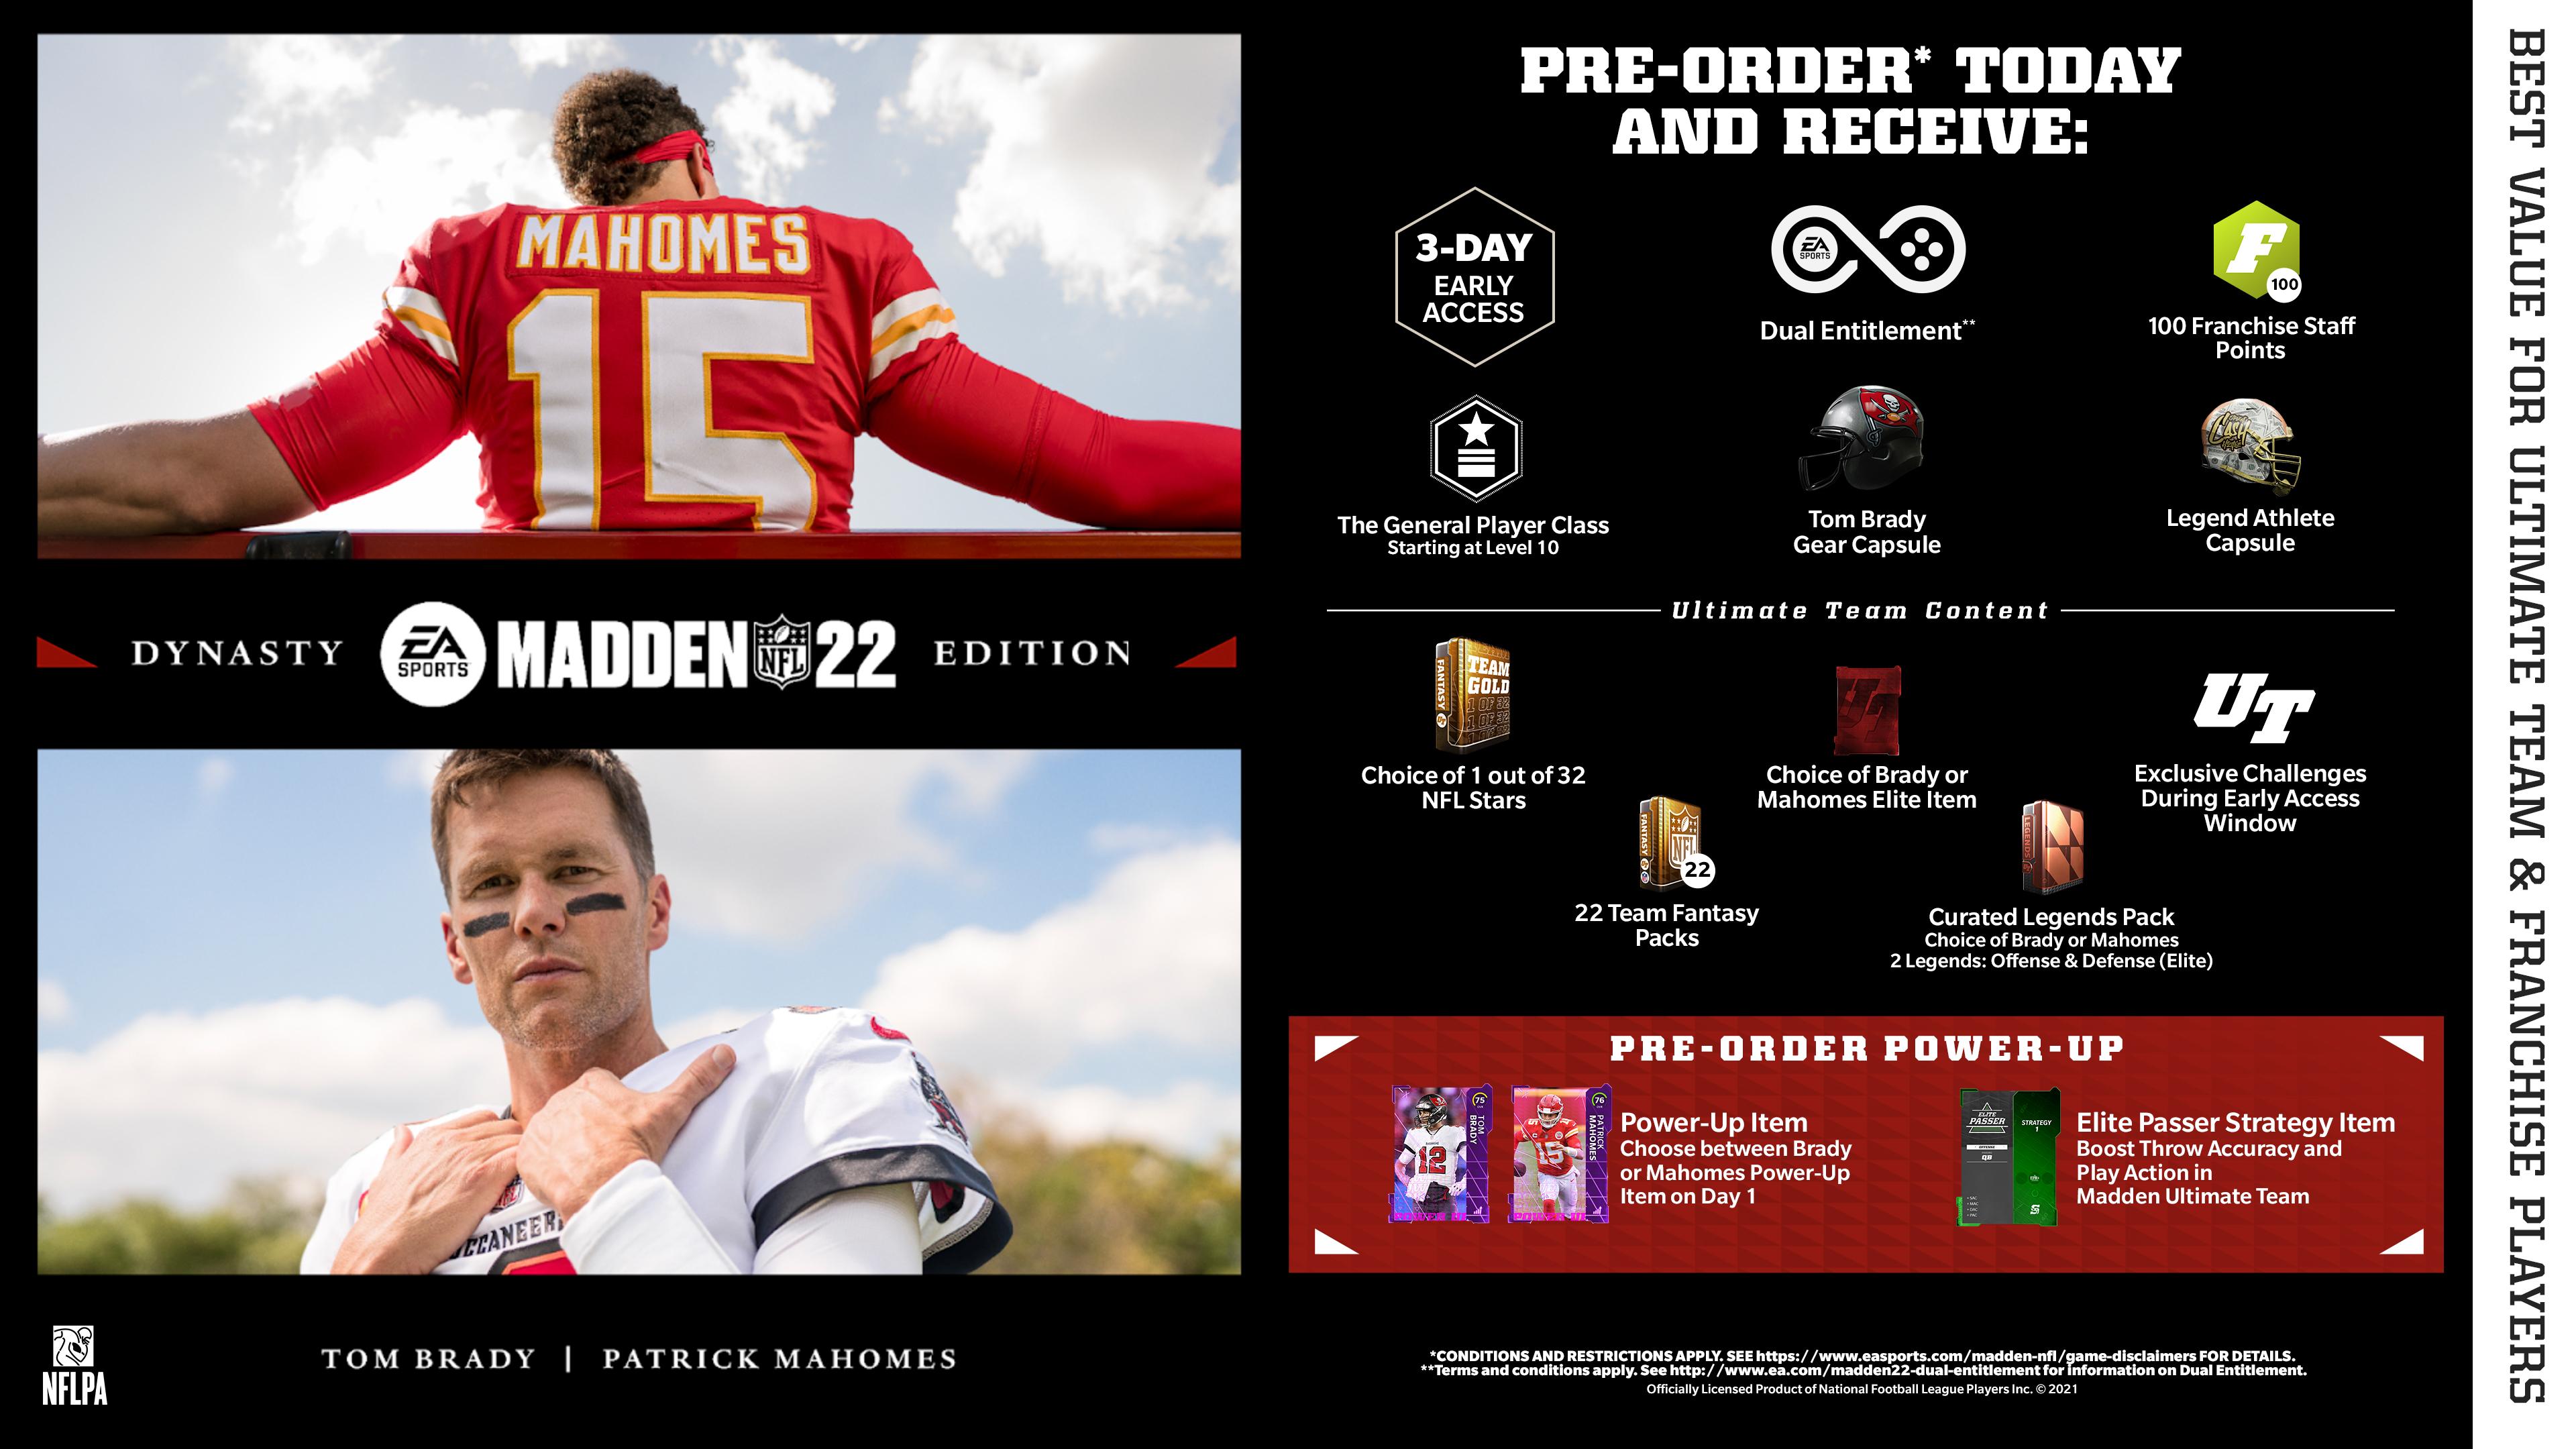 Скриншот №5 к Madden NFL 22 издание «Династия» PS4 and PS5